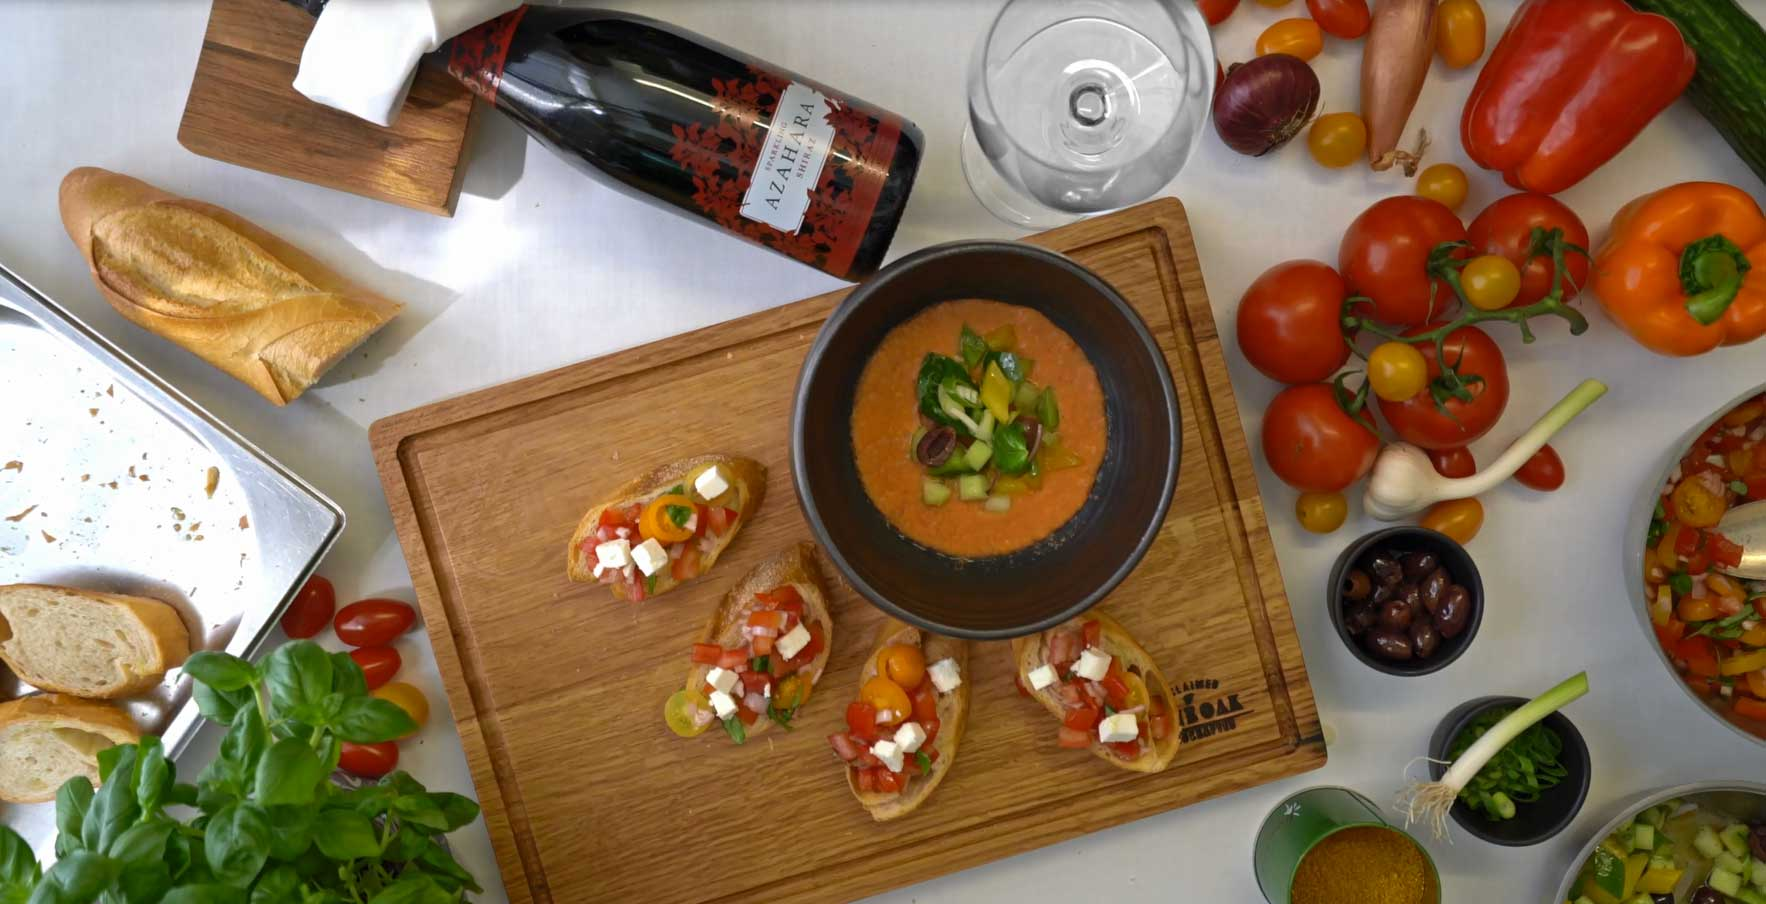 Tomaten Gazpacho mit Gemüse-Tapenade, Bruschetta, Feta-Käse & Basilikum